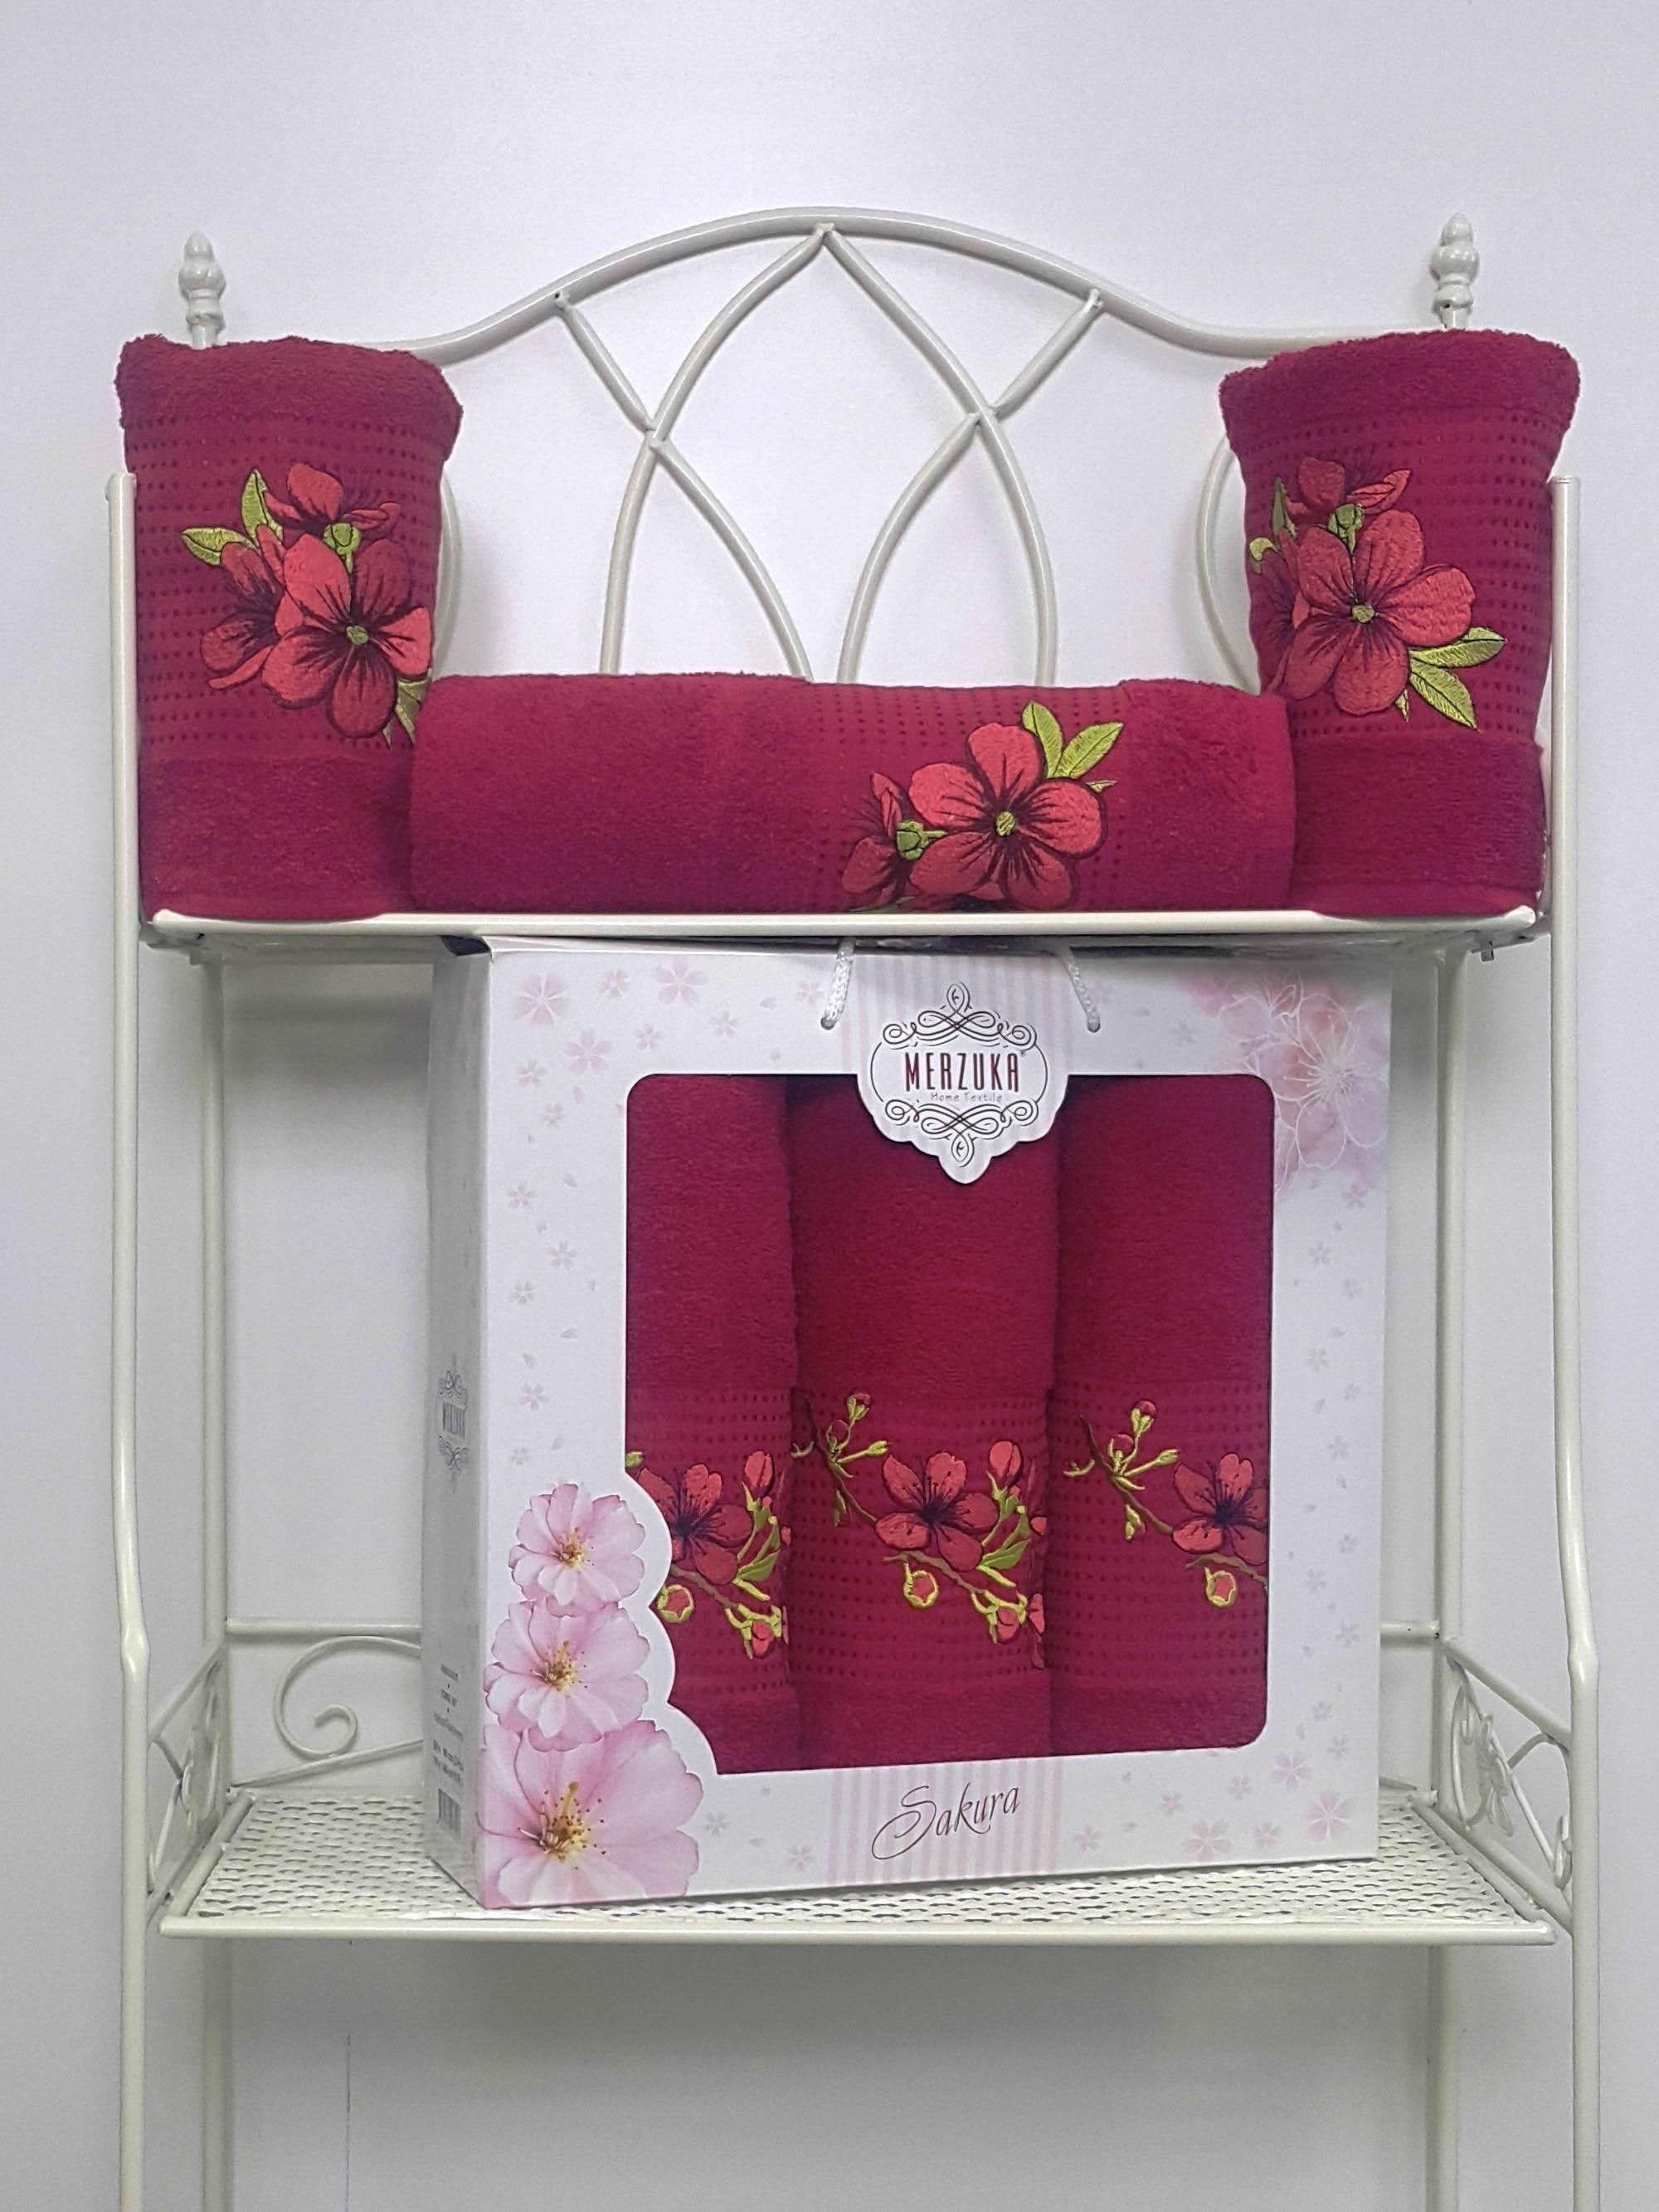 Полотенца Oran Merzuka Полотенце Sakura Цвет: Бордовый (Набор) полотенца oran merzuka набор из 3 полотенец sakura цвет зелёный